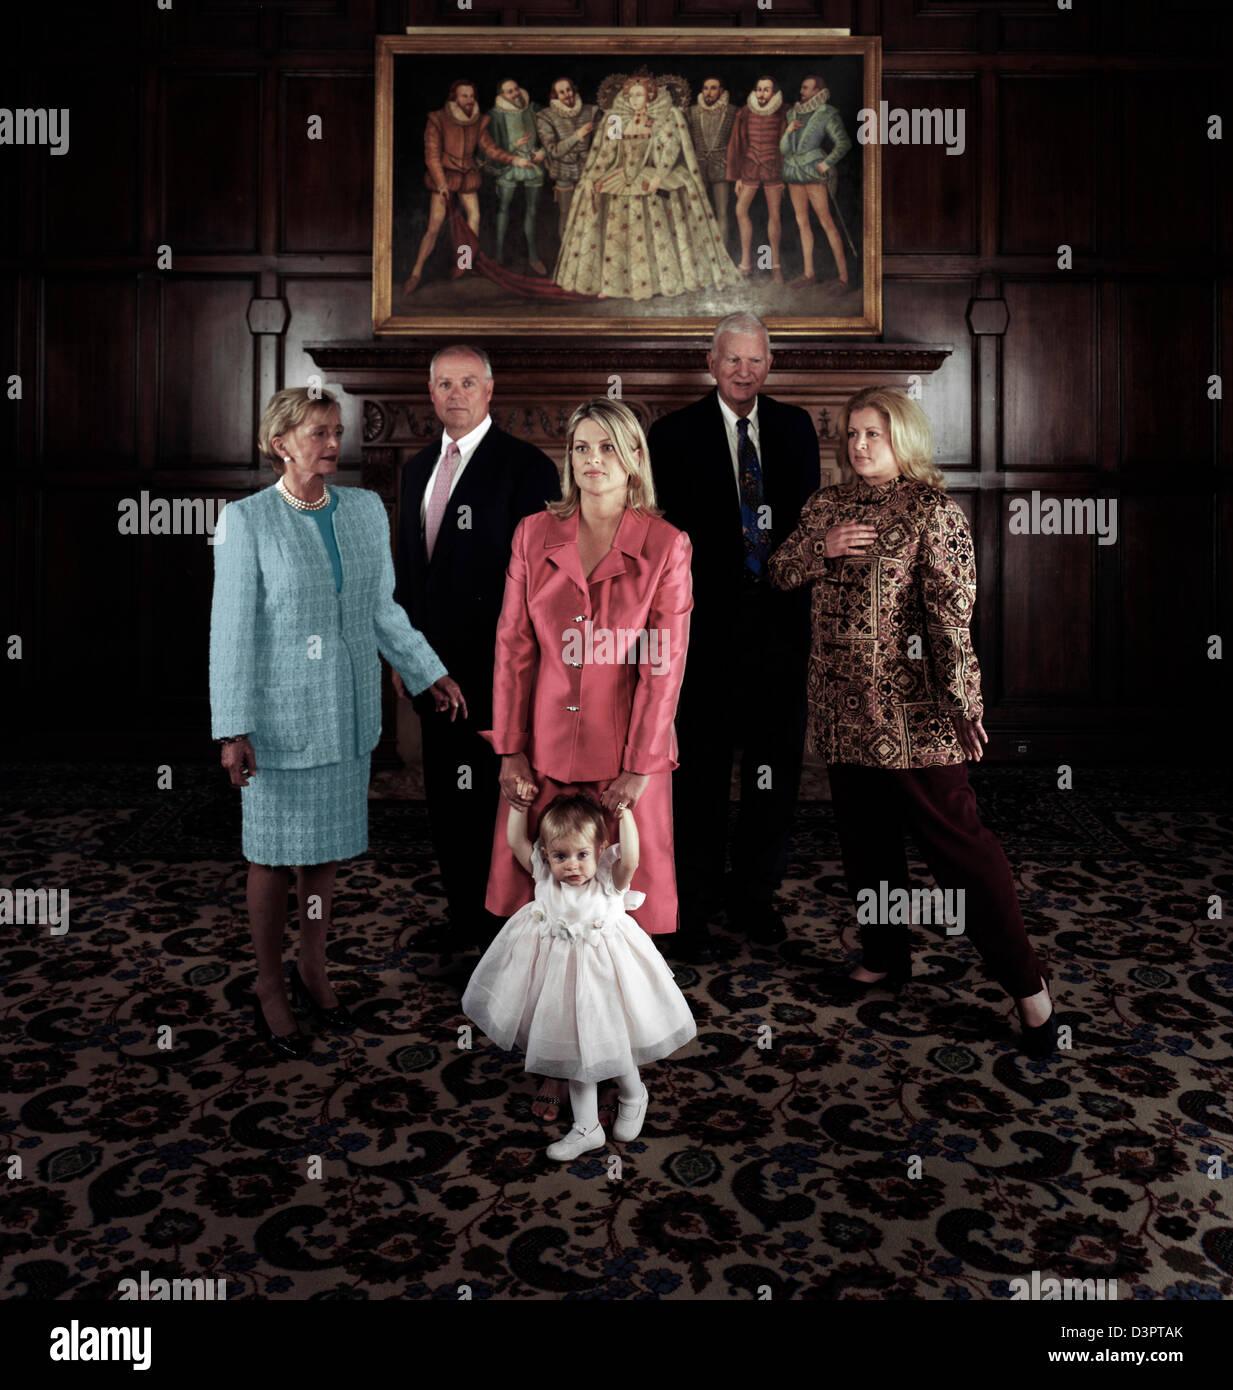 Gran familia Imagen De Stock